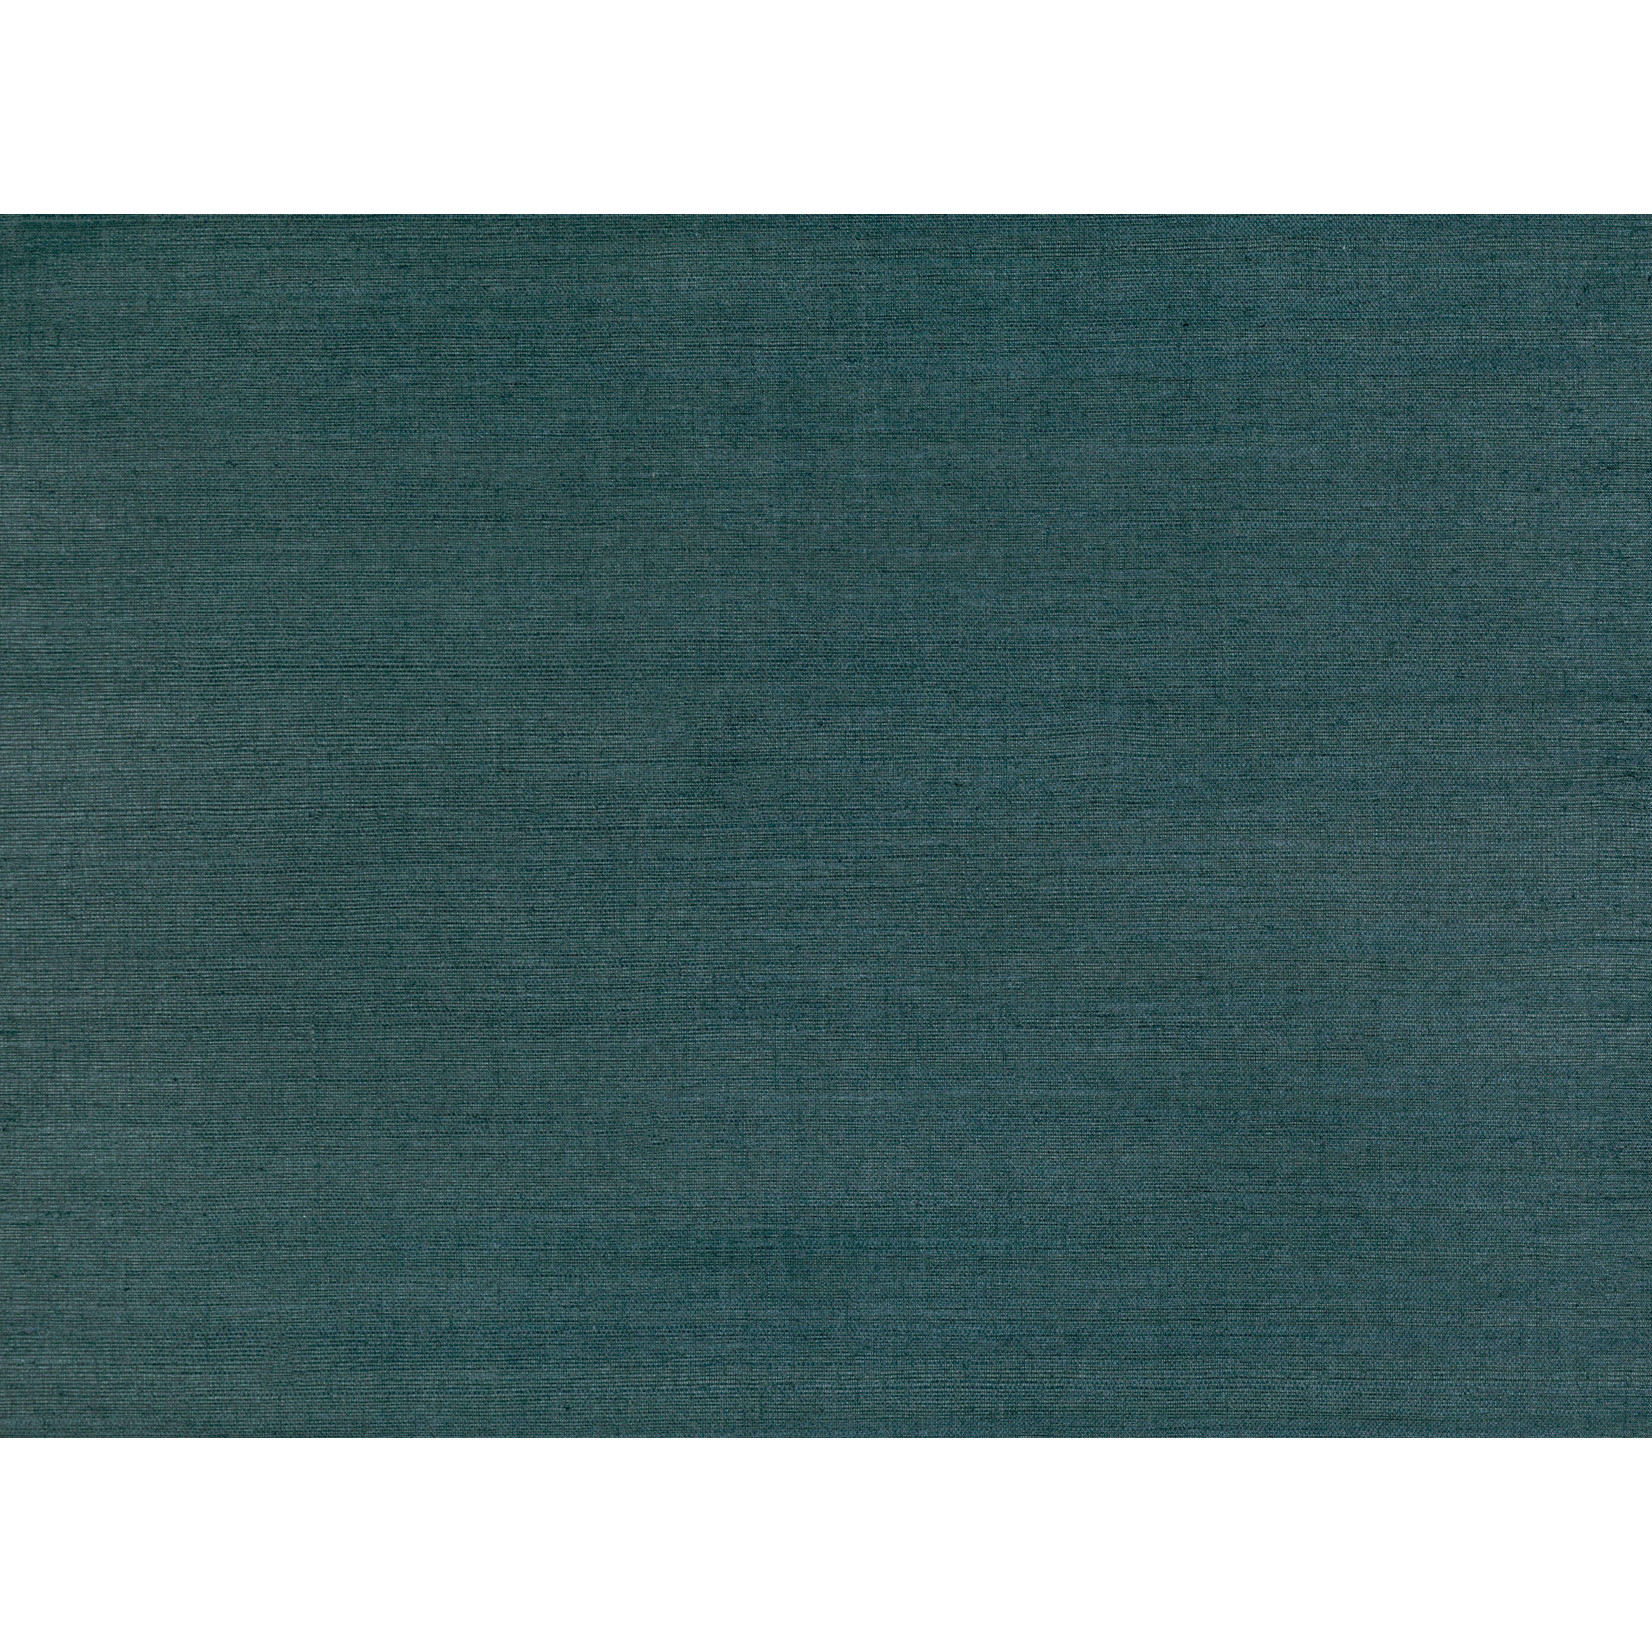 Mark Alexander Revêtements muraux tissés à la main en toile d'herbe | Océan Sisal